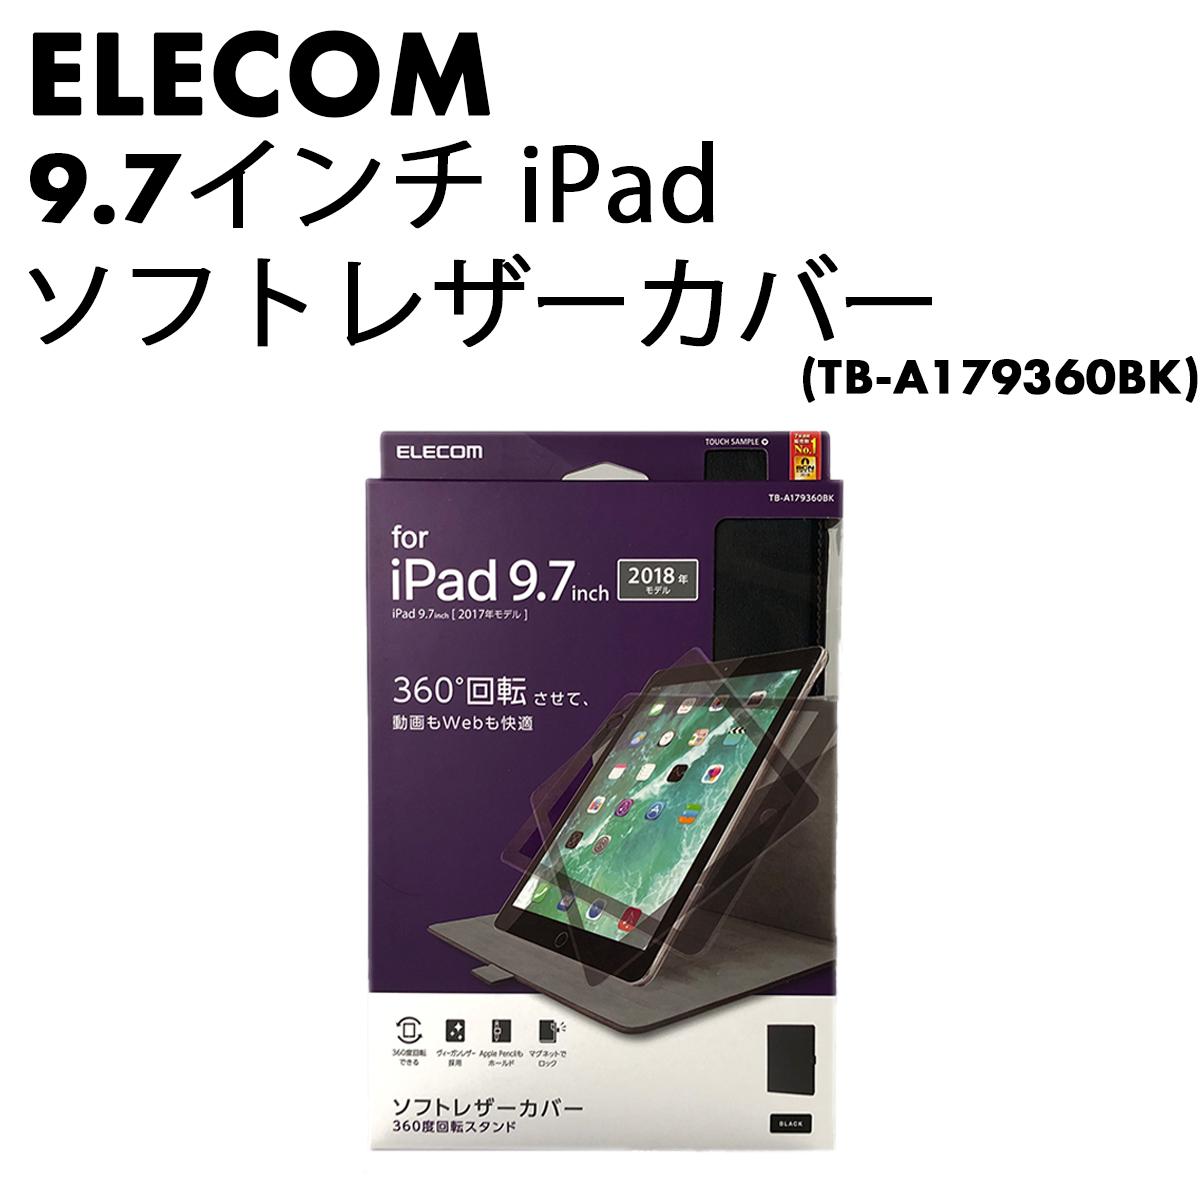 P3倍 再再販 送料無料 ELECOM 美品 9.7インチiPad TB-A179360BK Sランク 中古 ソフトレザーカバー